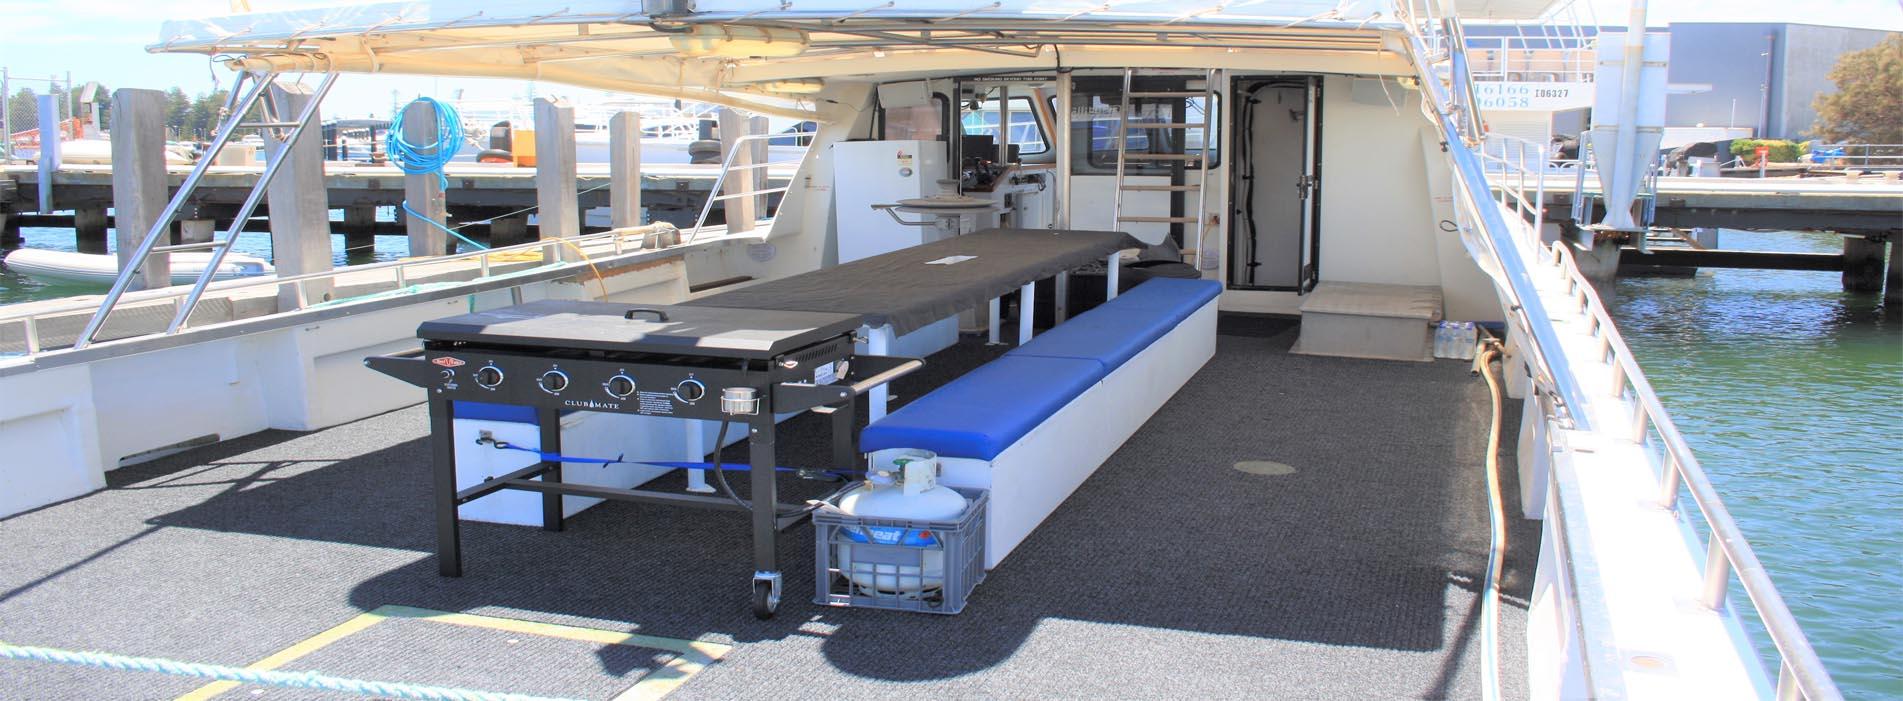 BLUE HORIZON BOAT CHARTER PERTH BACK DECK PHOTO